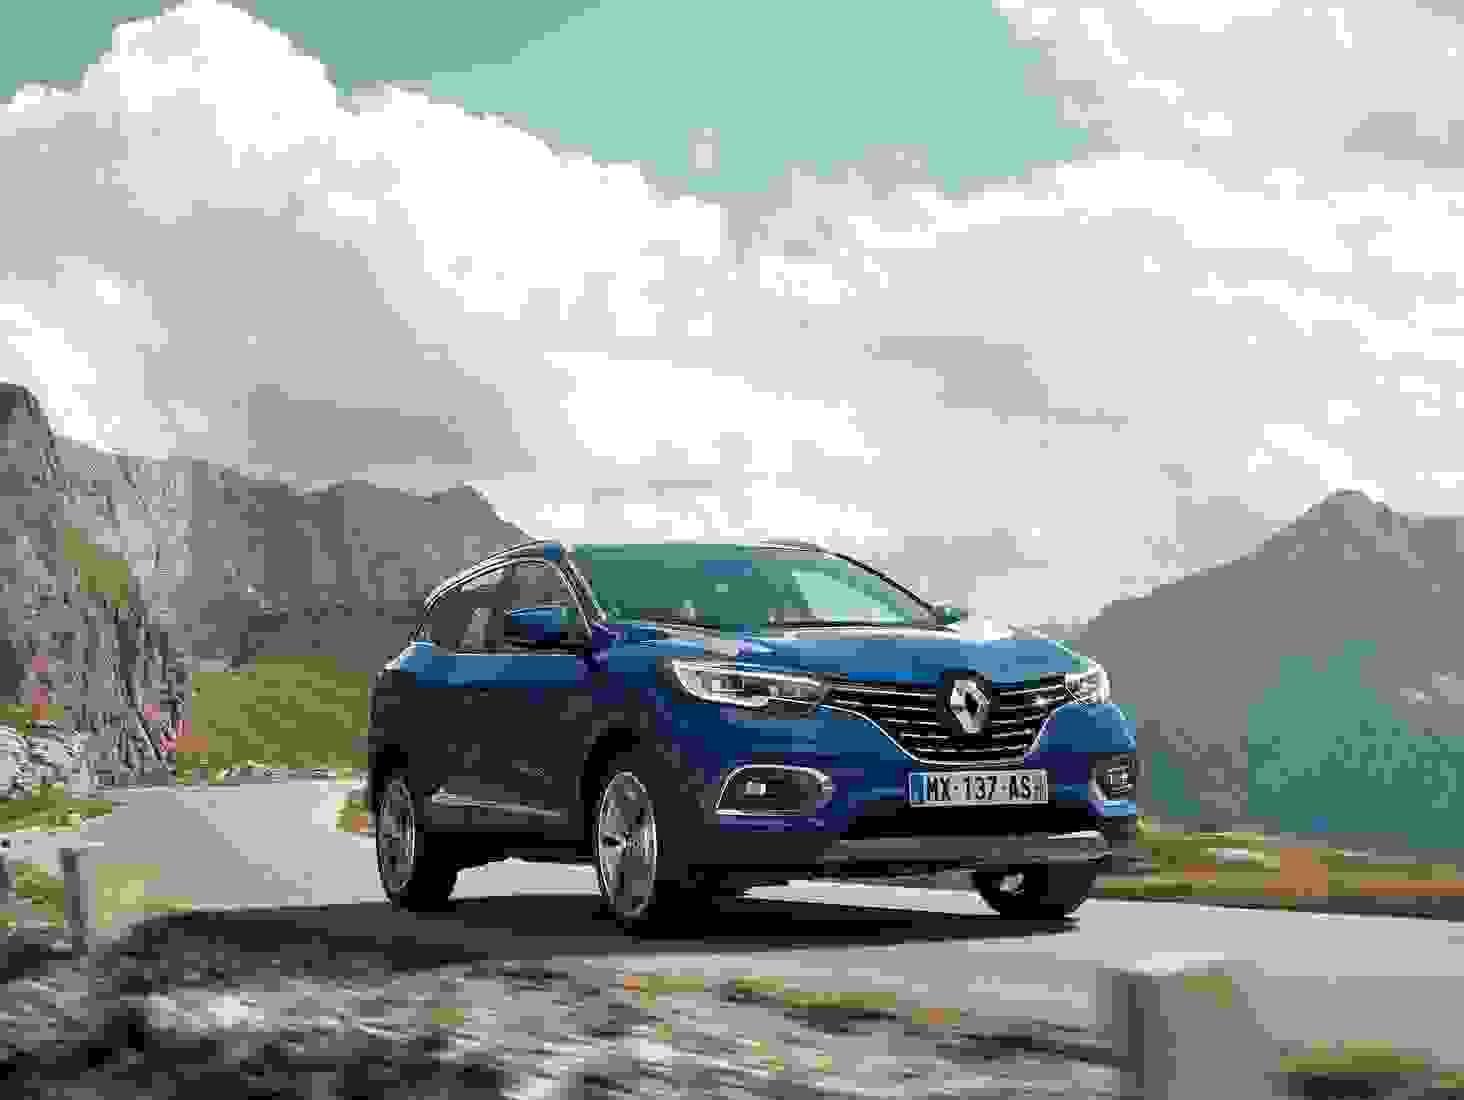 Renault Kadjar 2018 Eksterior Familiebil Hoejbenet Firhjulstraek